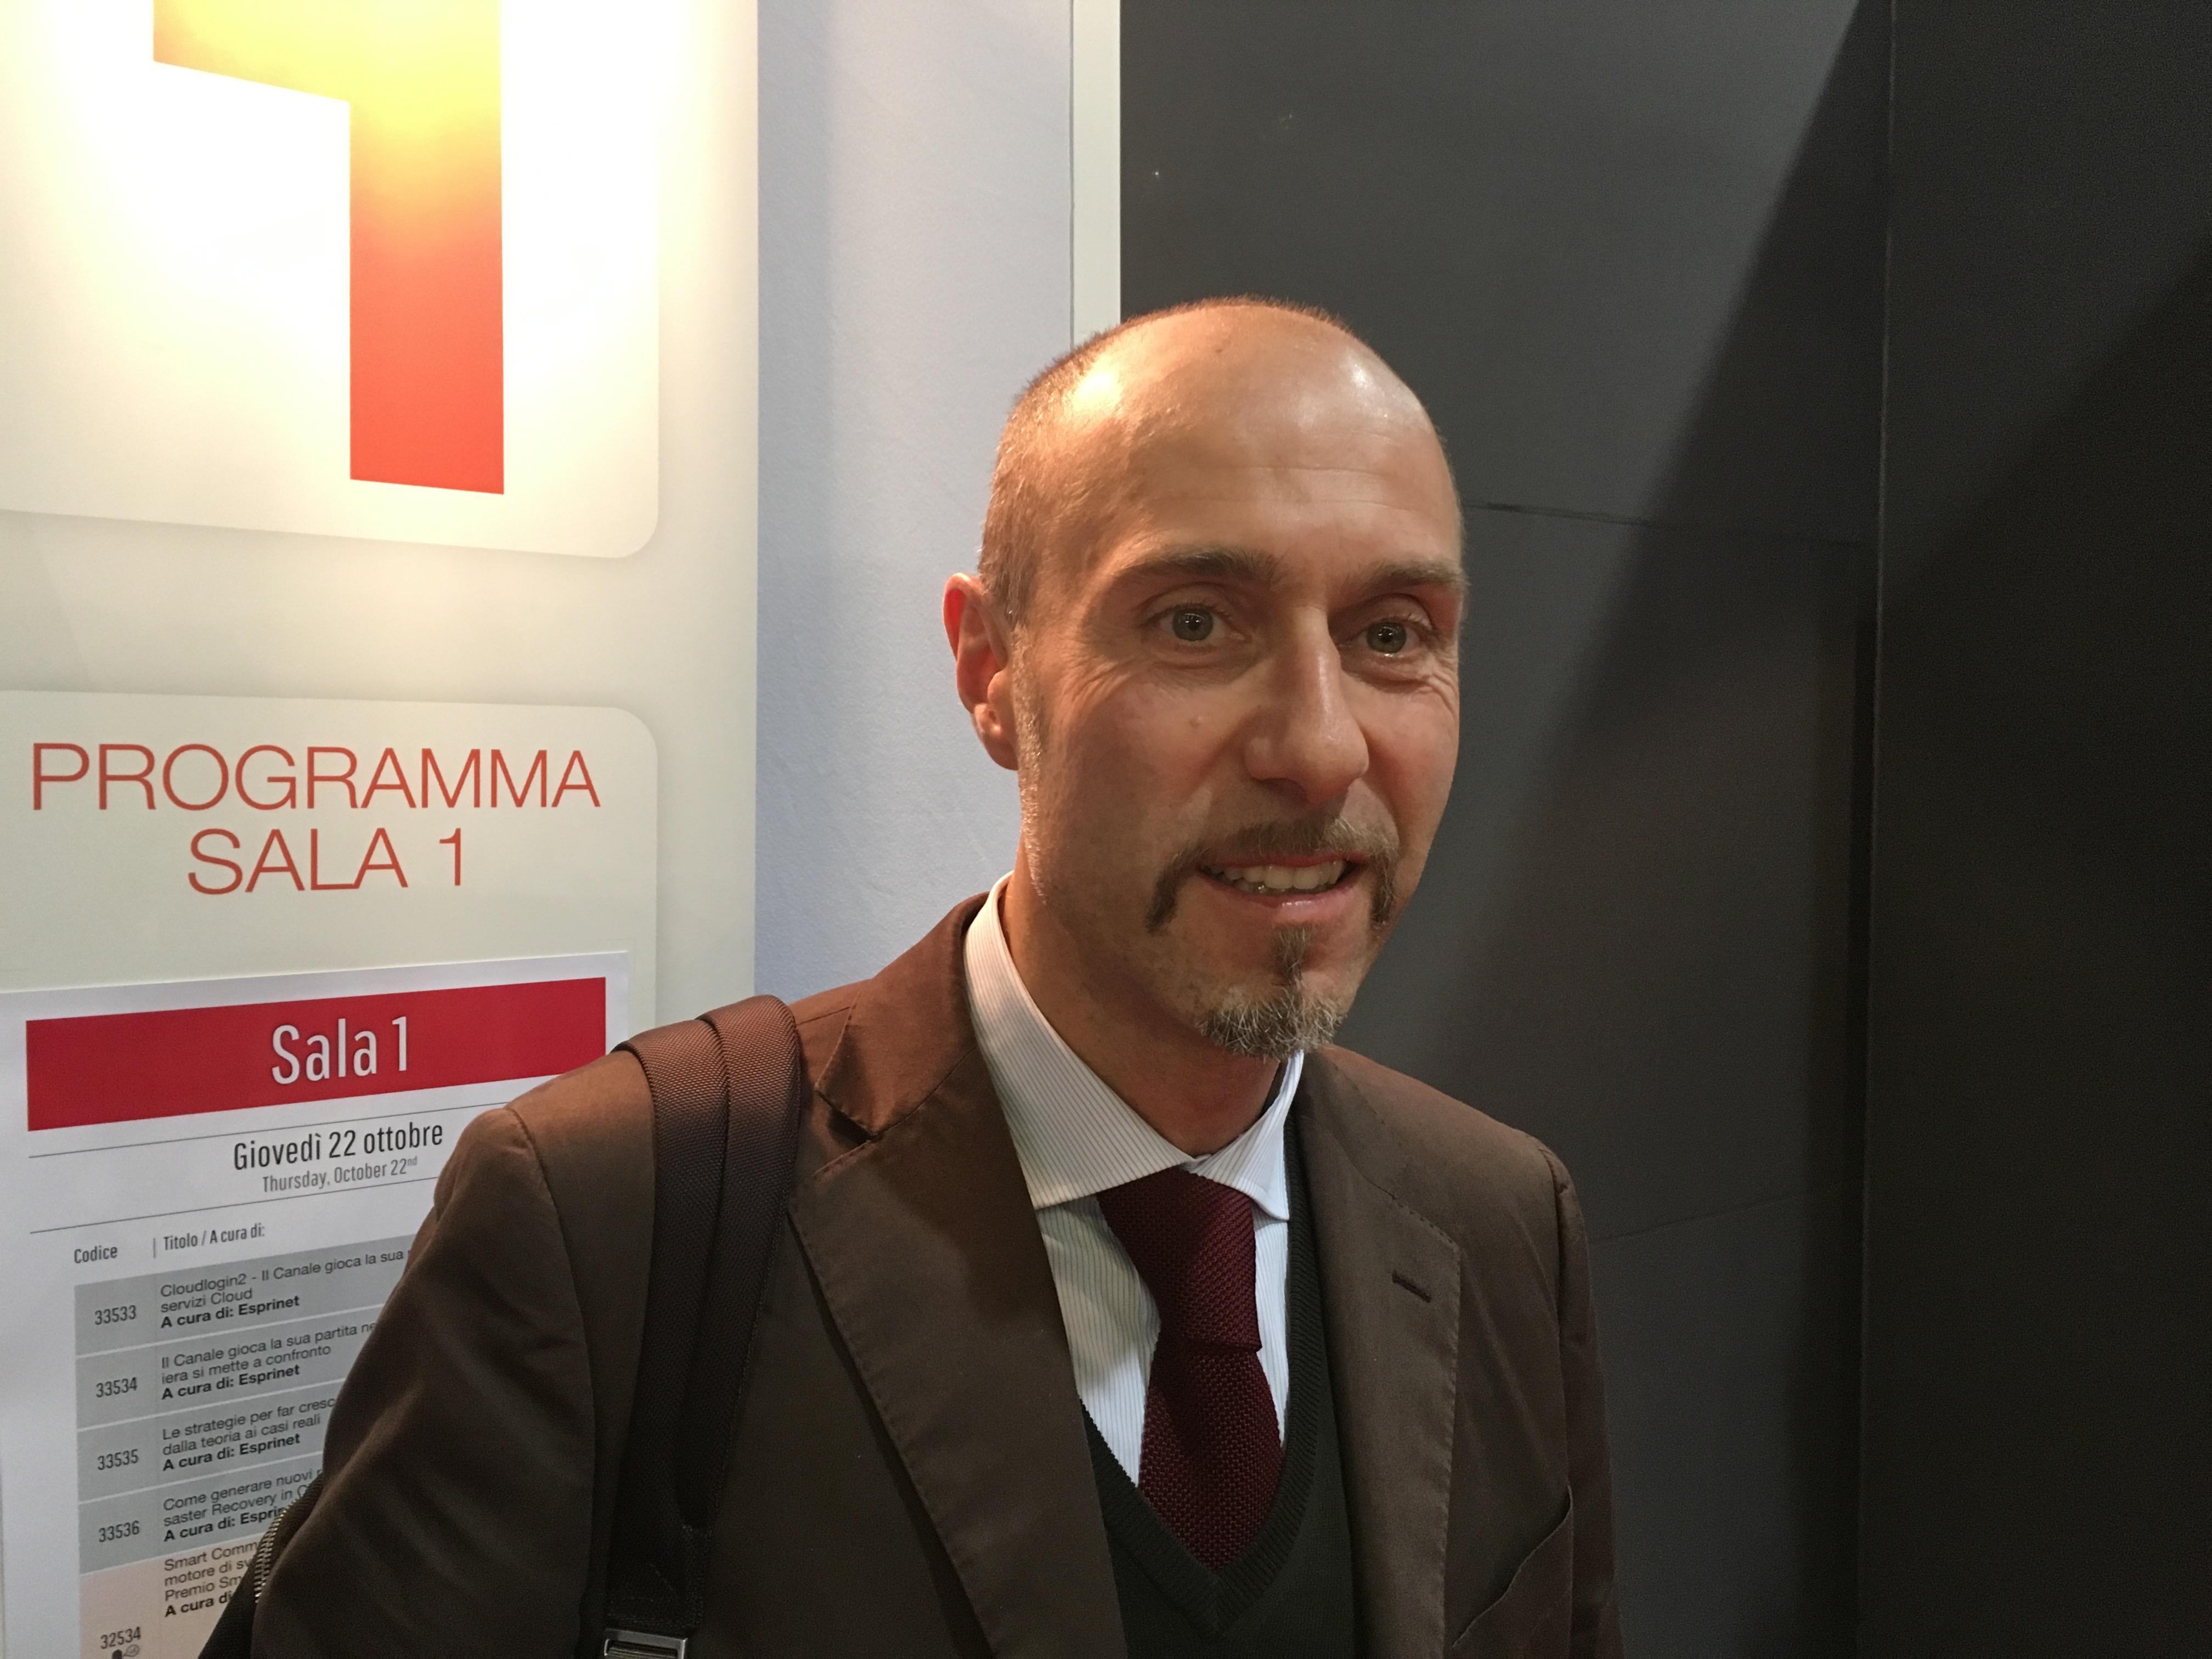 Mauro Bacchiocchi, Sales Director di TI Digital Solutions  Cloud & OTT